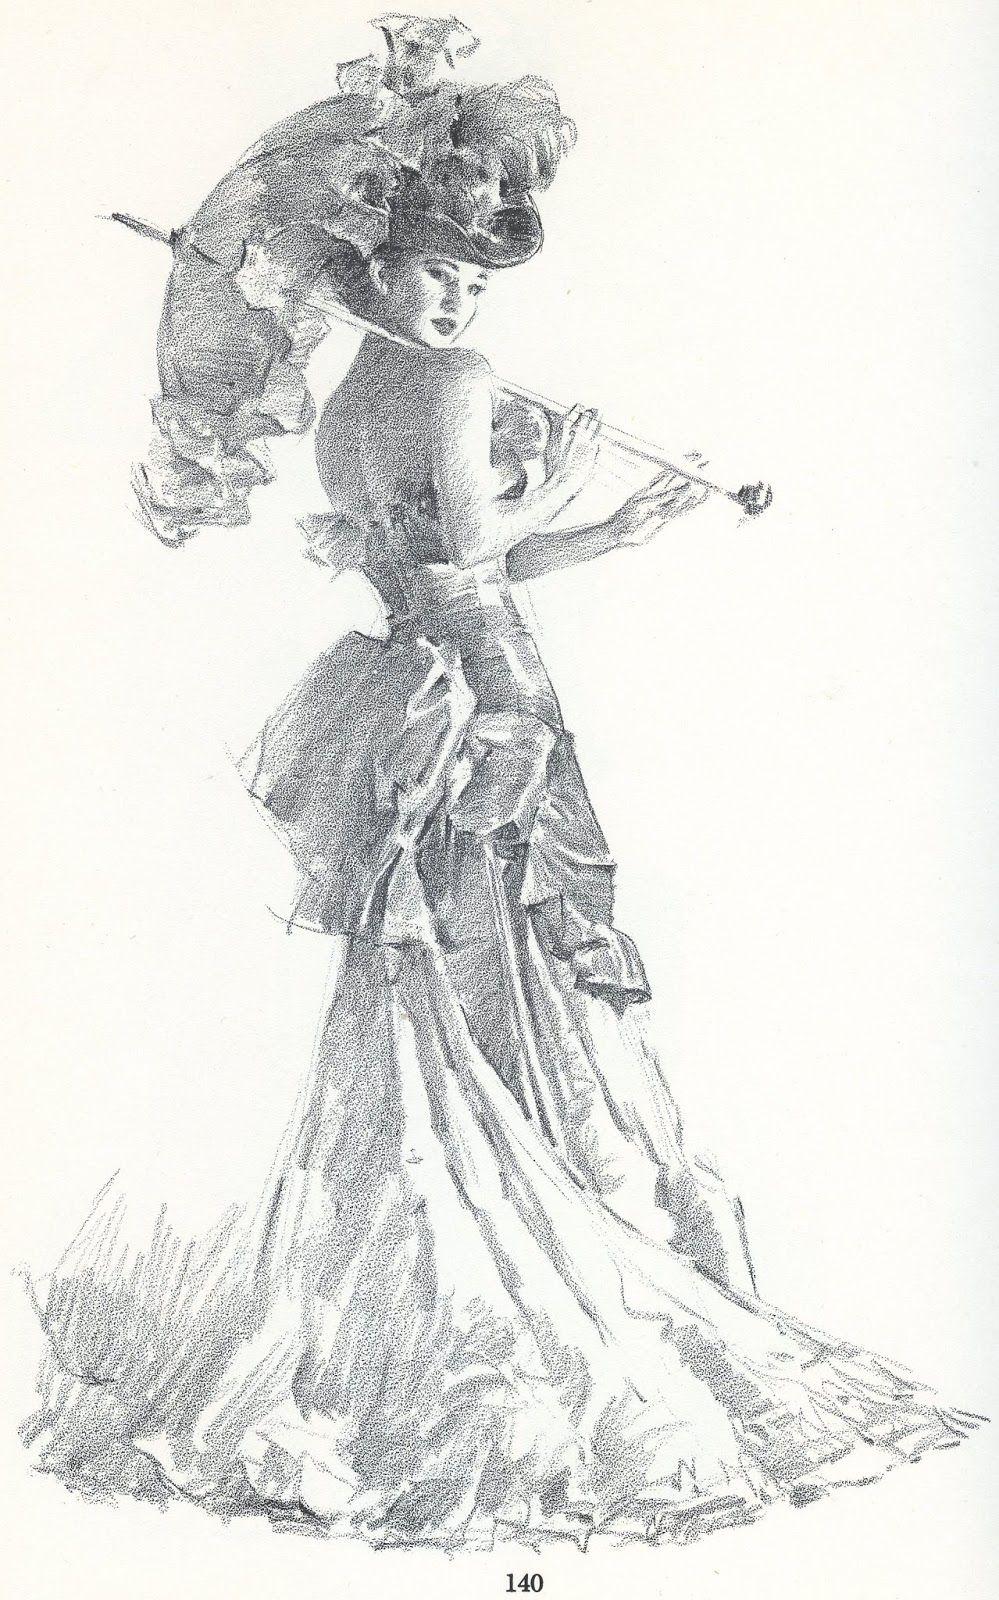 Andrew Loomis Art | The Masters of Pencil Illustration | Pinterest ...